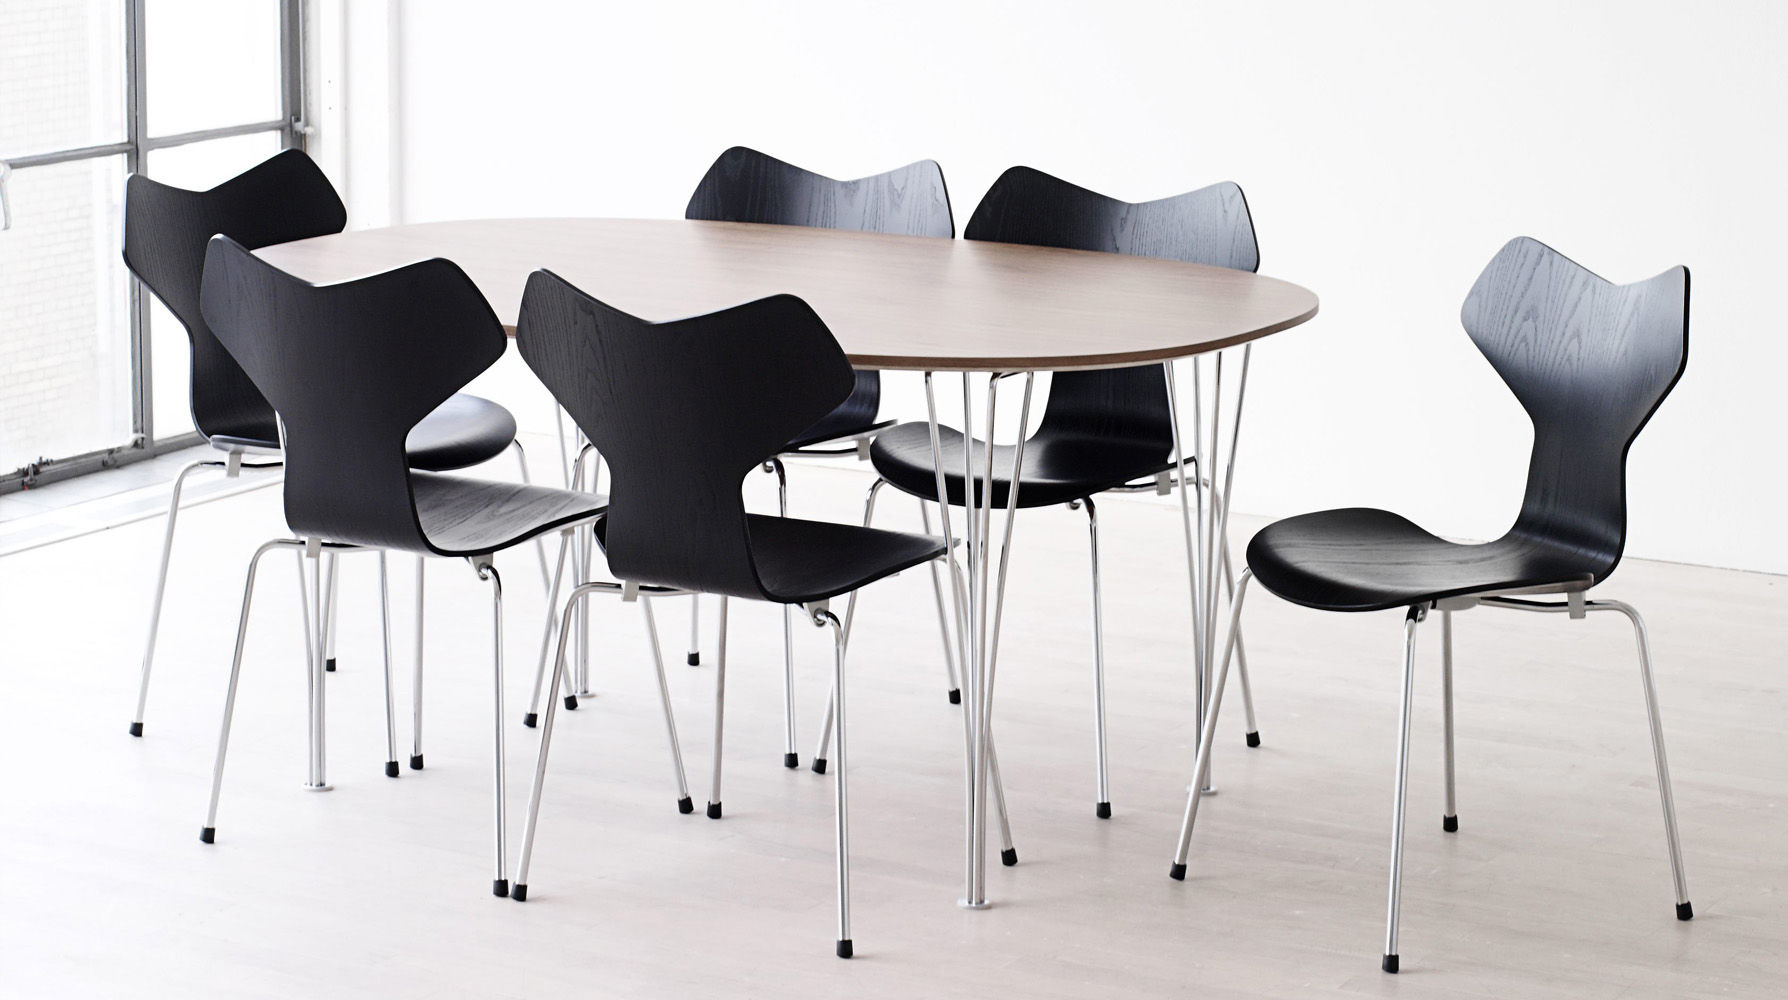 chaise empilable grand prix bois blanc fritz hansen. Black Bedroom Furniture Sets. Home Design Ideas